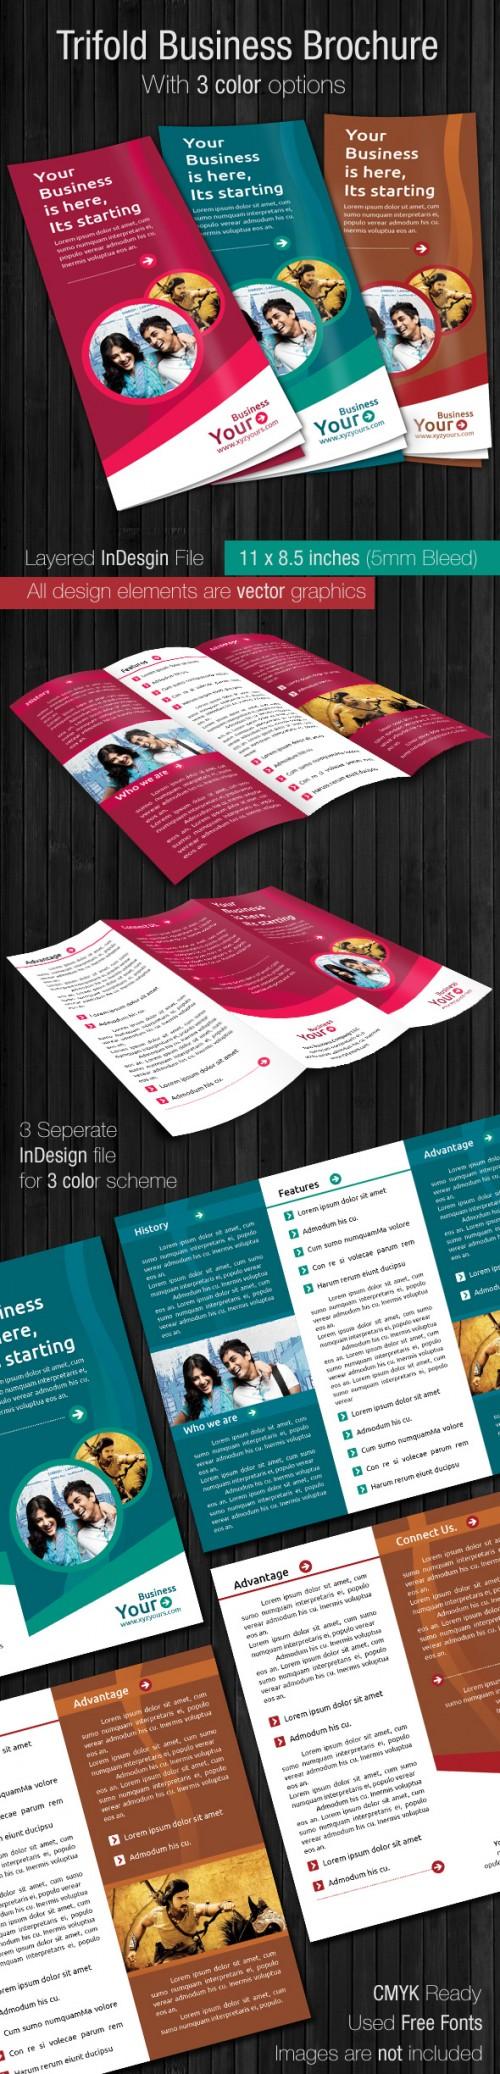 18_Tri Fold Brochure Template Business 3 Color